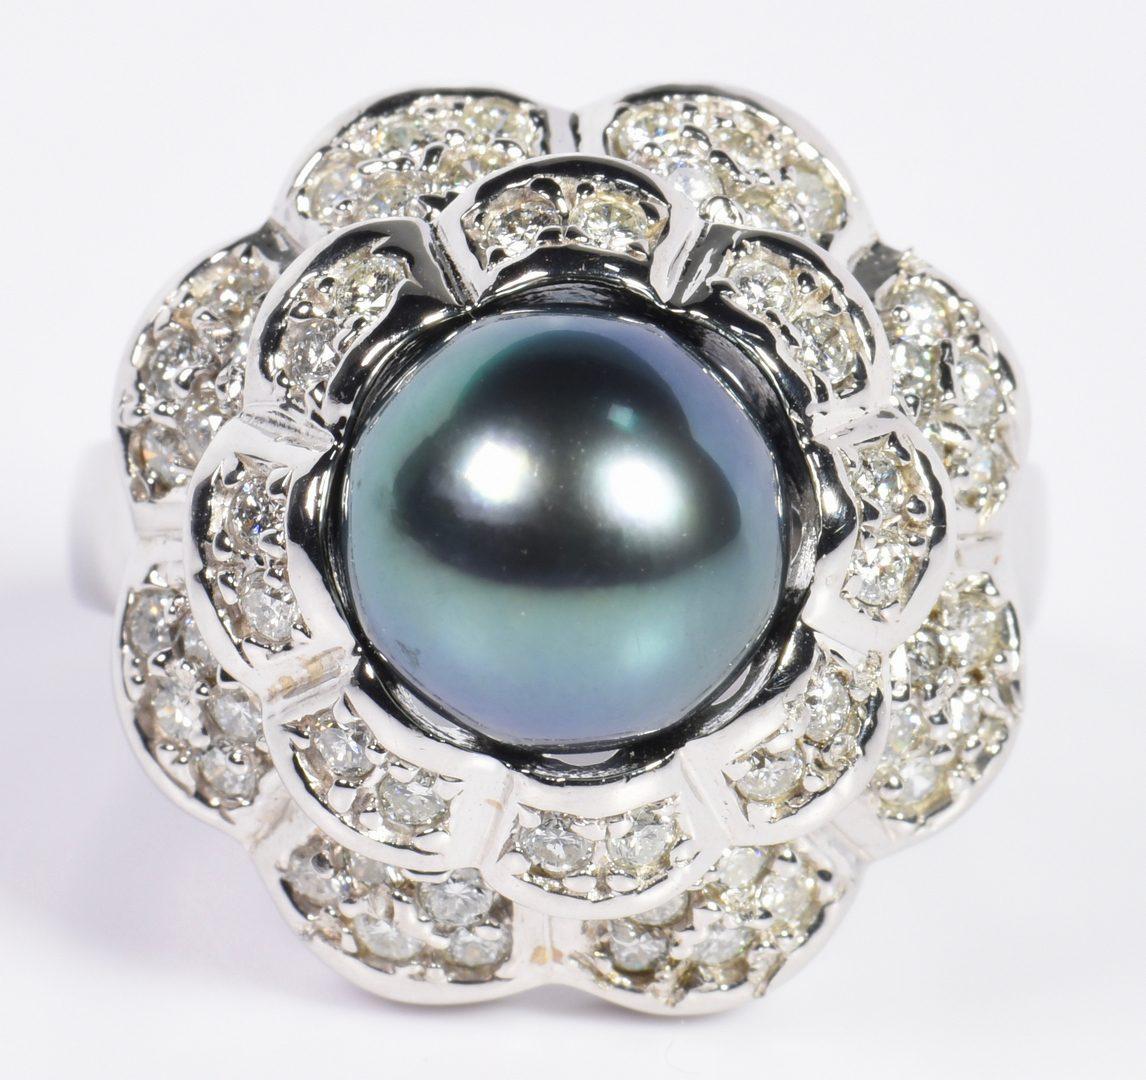 Lot 3: Tahitian Pearl and Diamond Jewelry